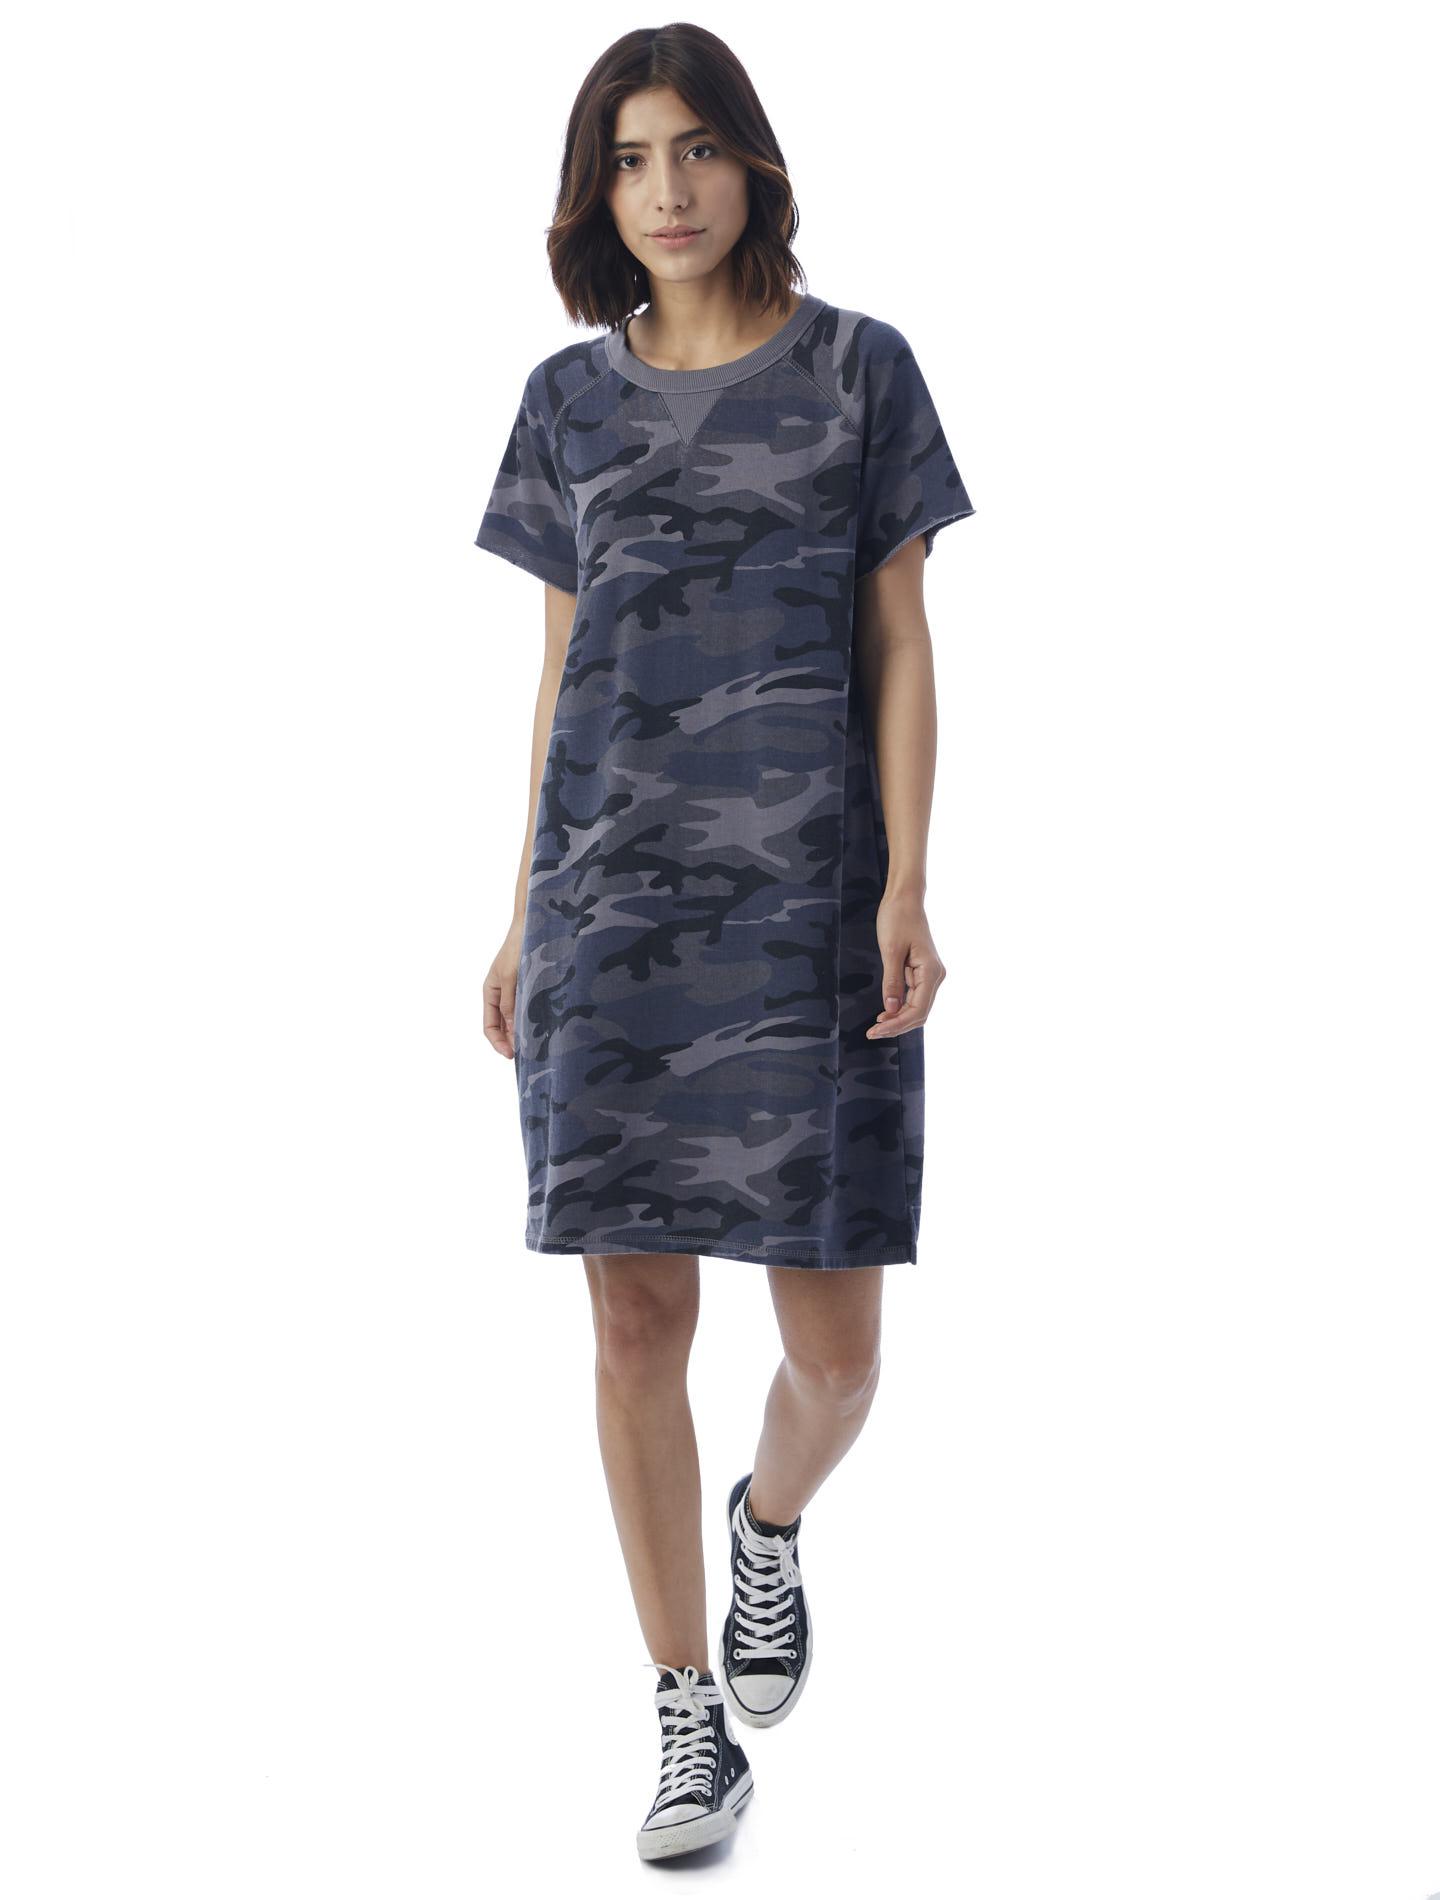 Gym Rat Printed Burnout French Terry Sweatshirt Dress